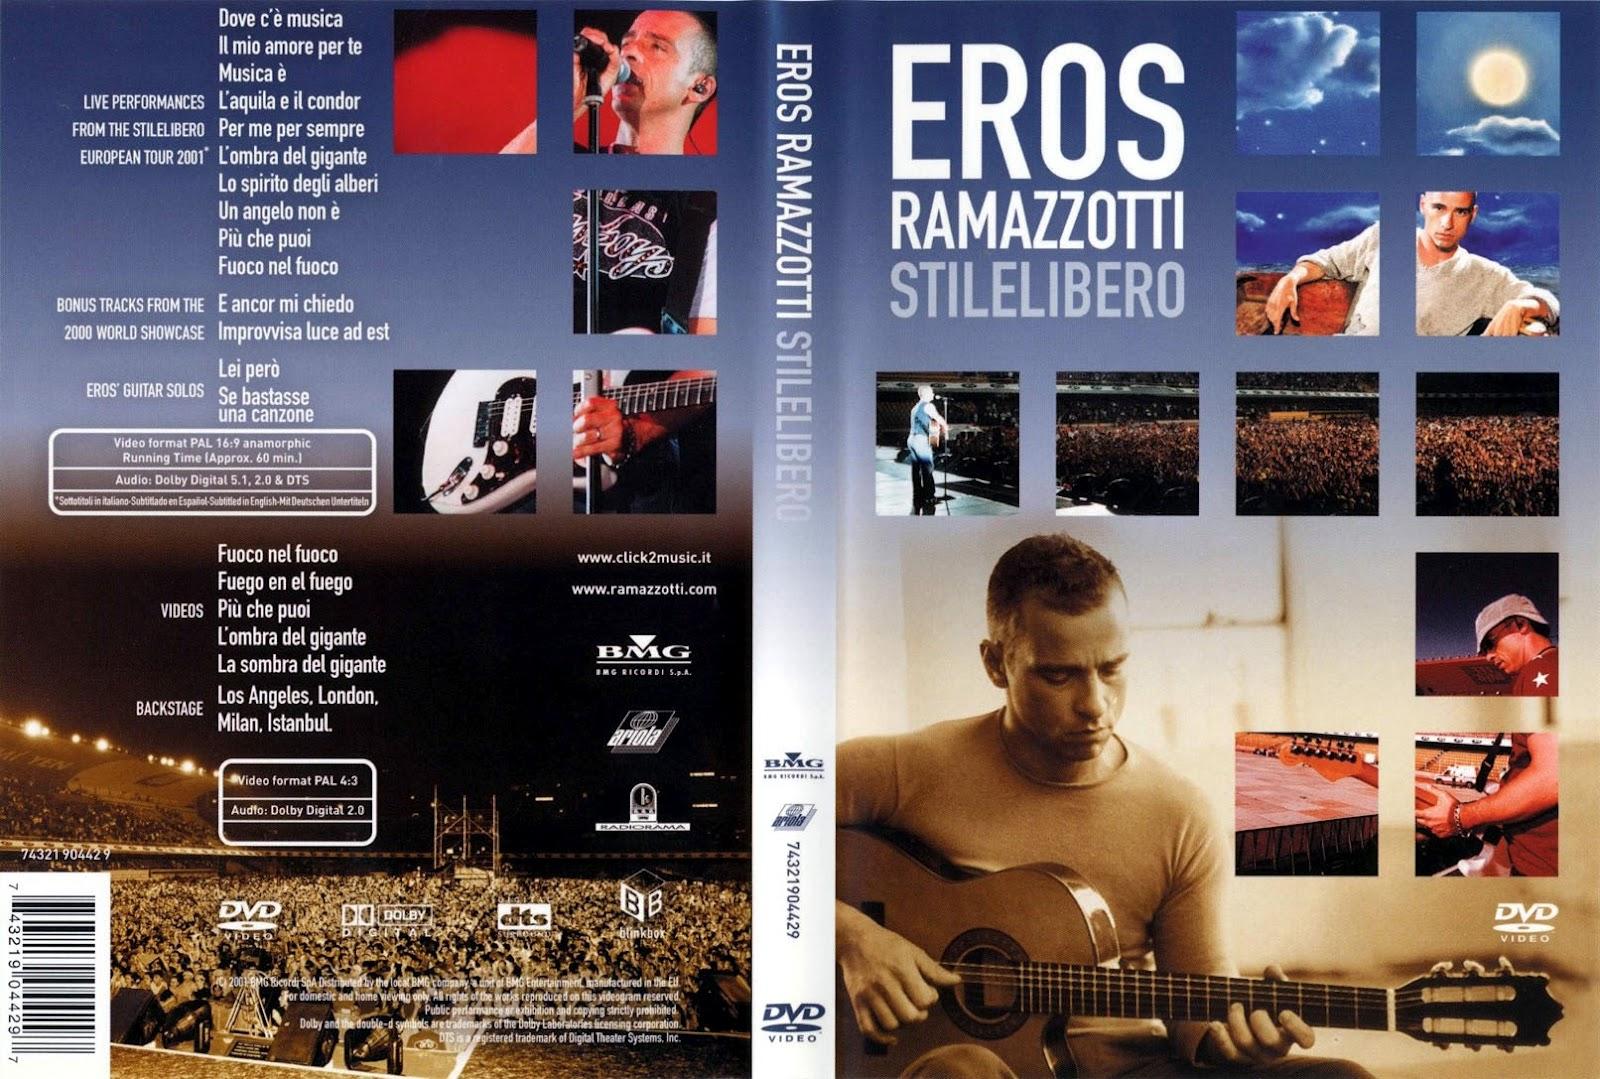 http://4.bp.blogspot.com/-dpRdfxos_ts/T6XmExJyaSI/AAAAAAAAMtM/vgnQJEavK0g/s1600/Eros_ramazzotti_-_stile_libero.jpg